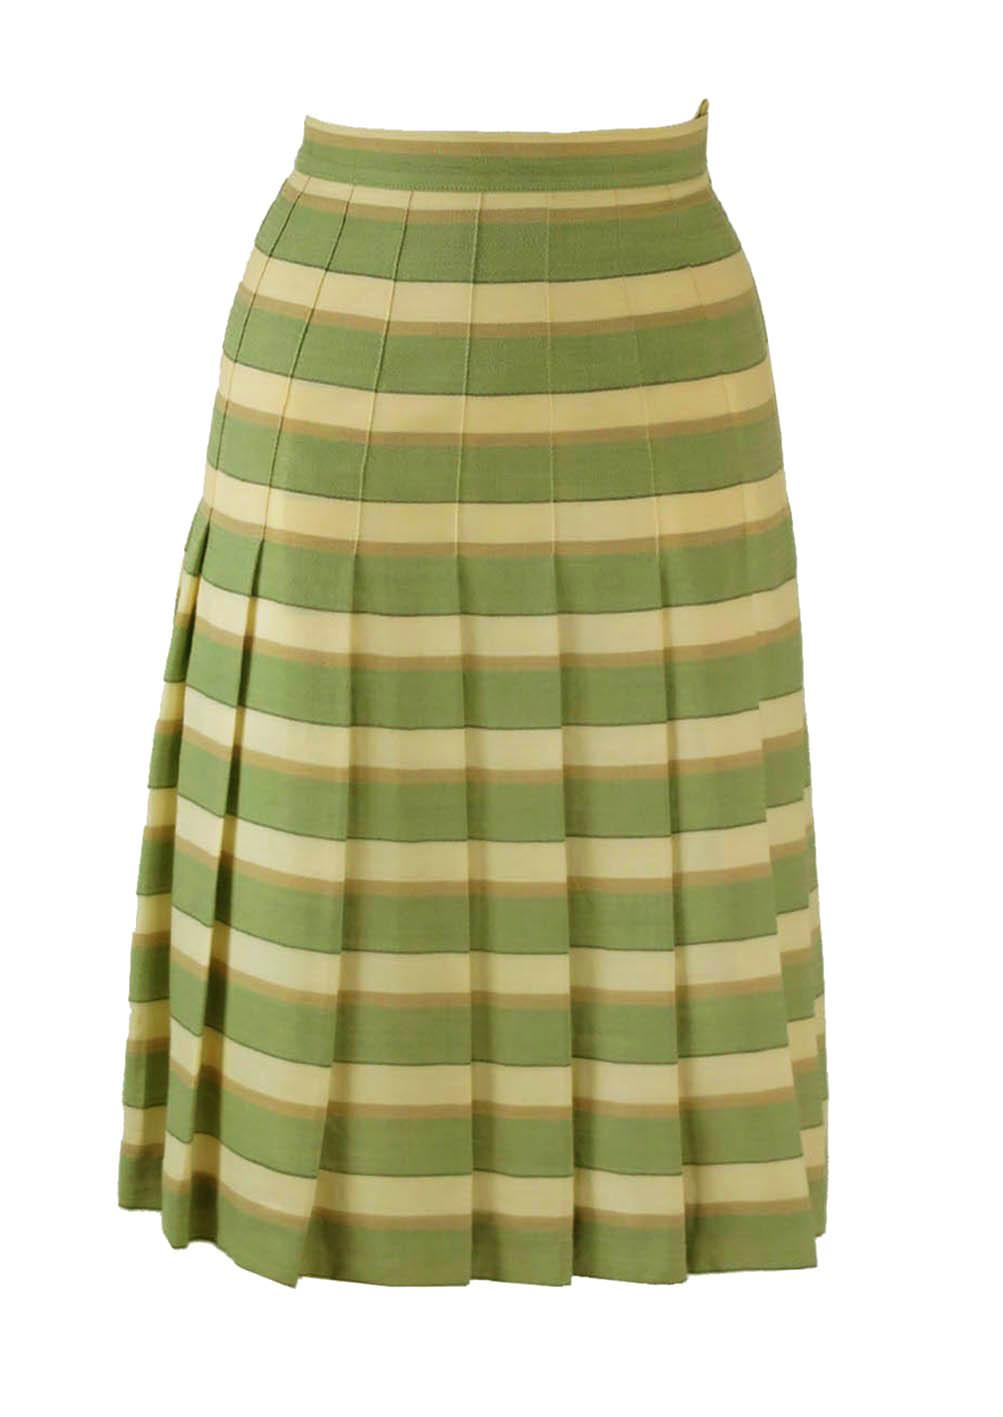 e74bd9b1440f5a Wool Pleat Skirt with Green, Cream & Beige Stripe Detail – S – Reign ...